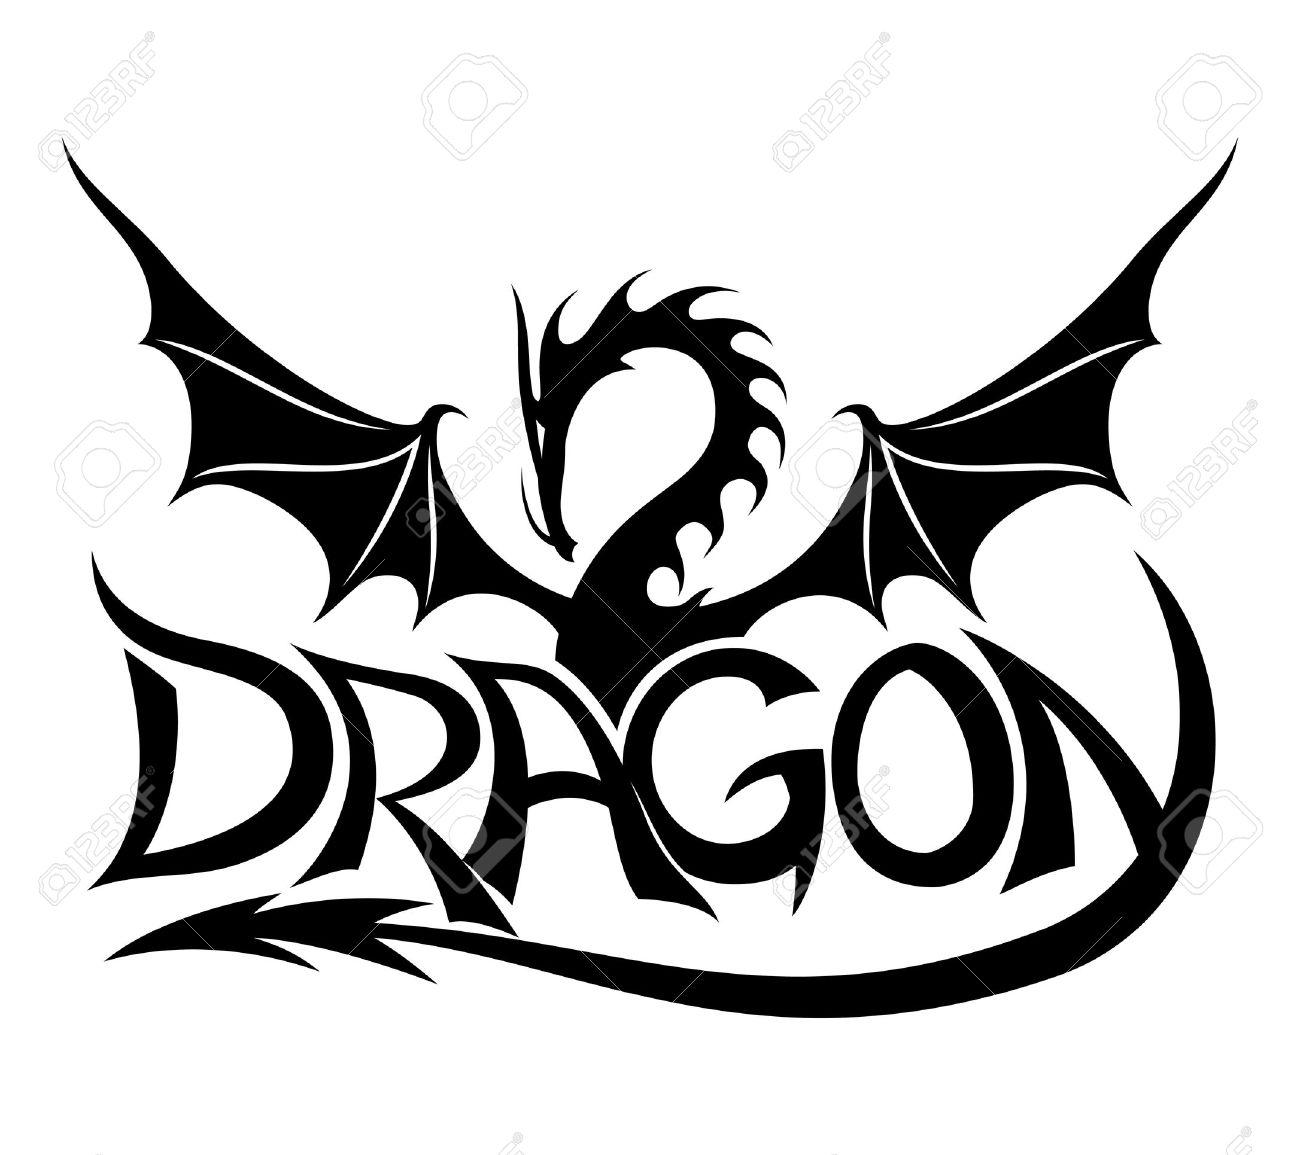 dragon sign royalty free cliparts vectors and stock illustration rh 123rf com vector dragon head vector dragon ball